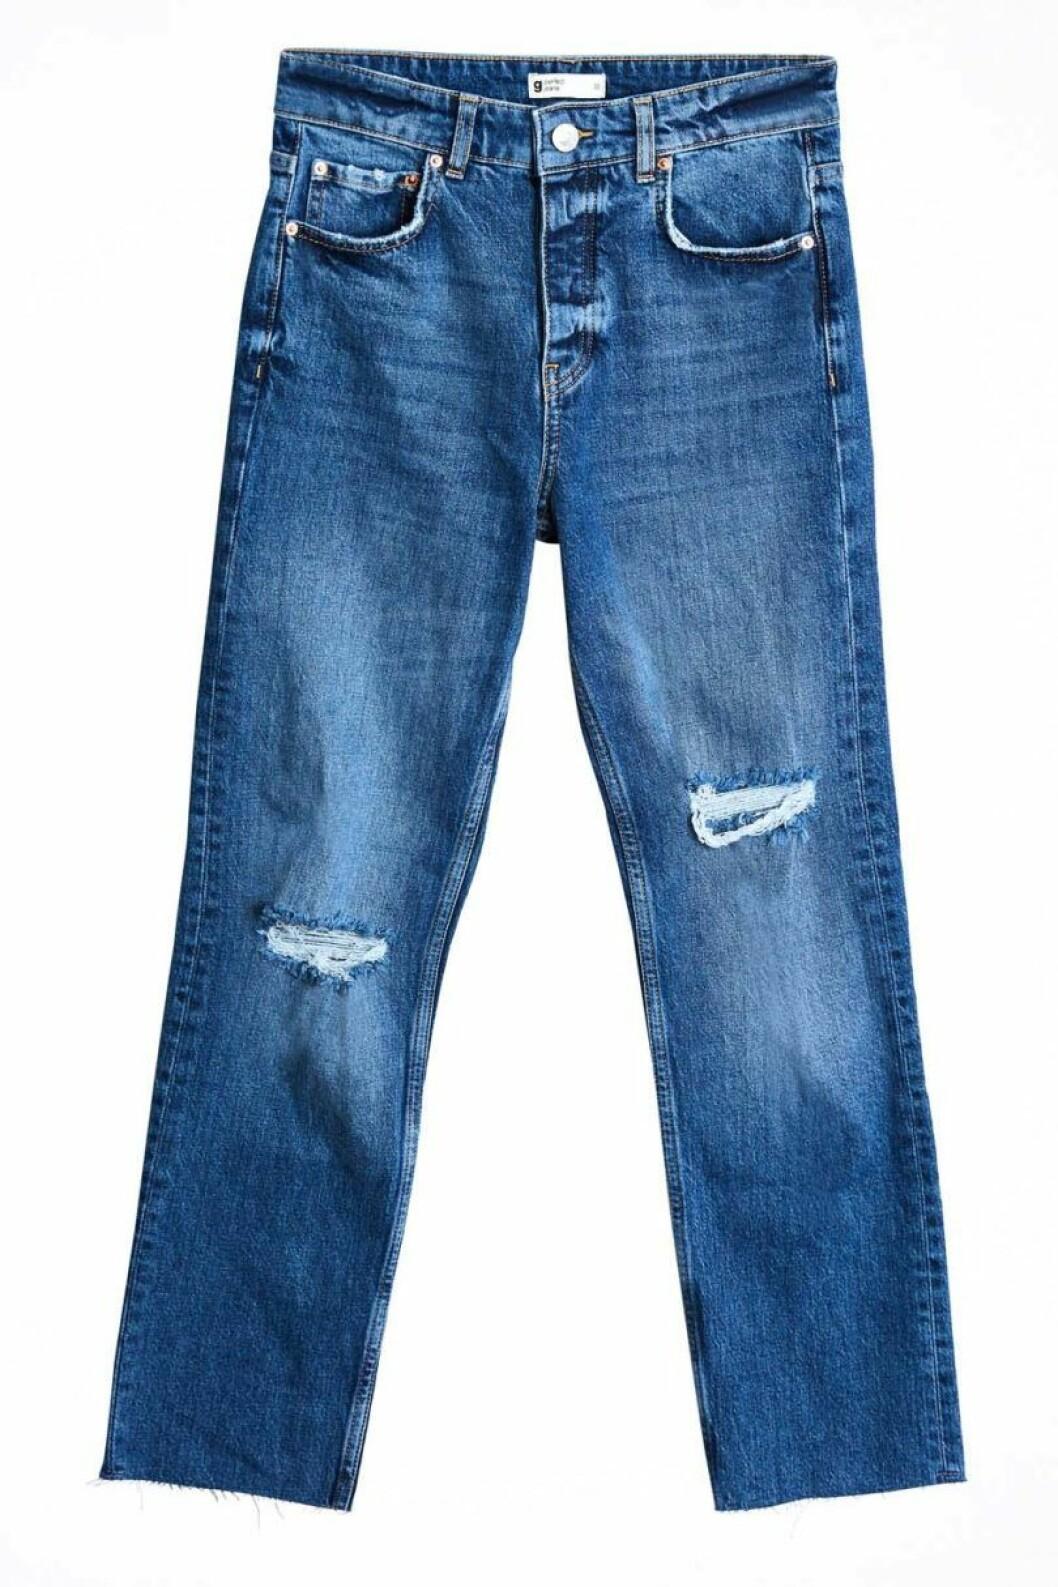 slitna-jeans-denim.gina-tricot